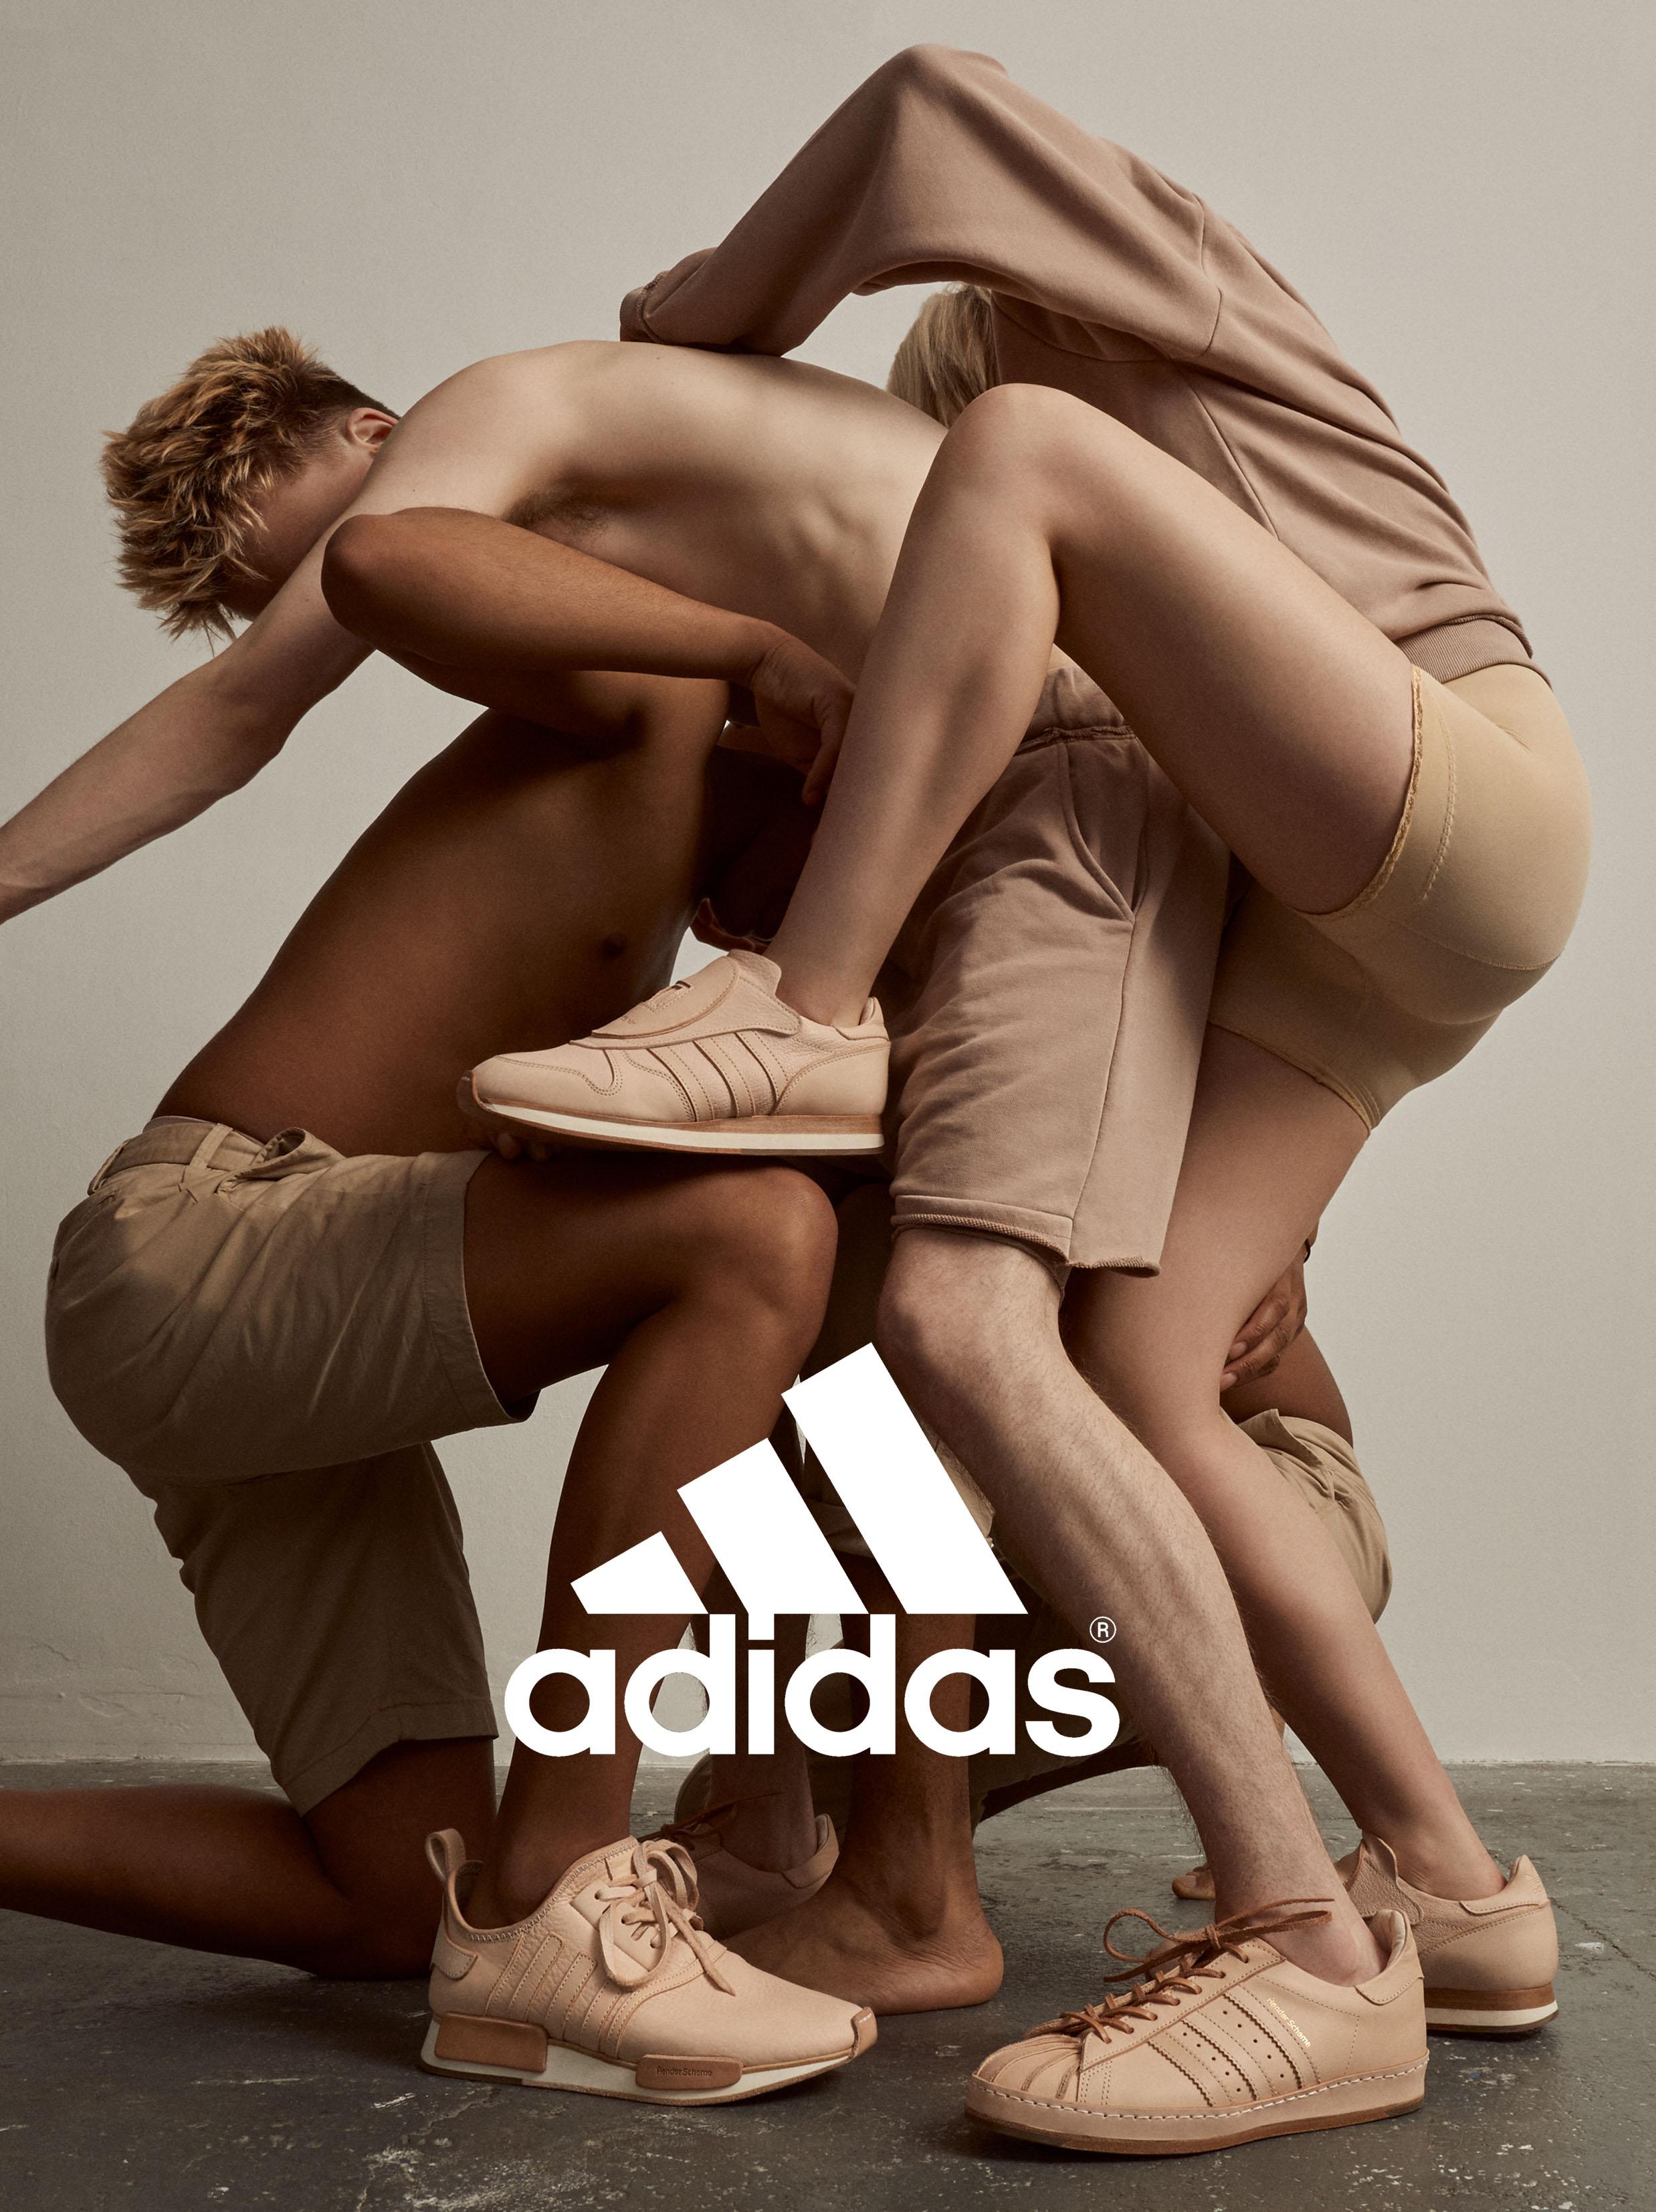 Adidas Originals x Hender Scheme F/W 2017 | Alessio Bolzoni | Adidas | Numerique Retouch Photo Retouching Studio